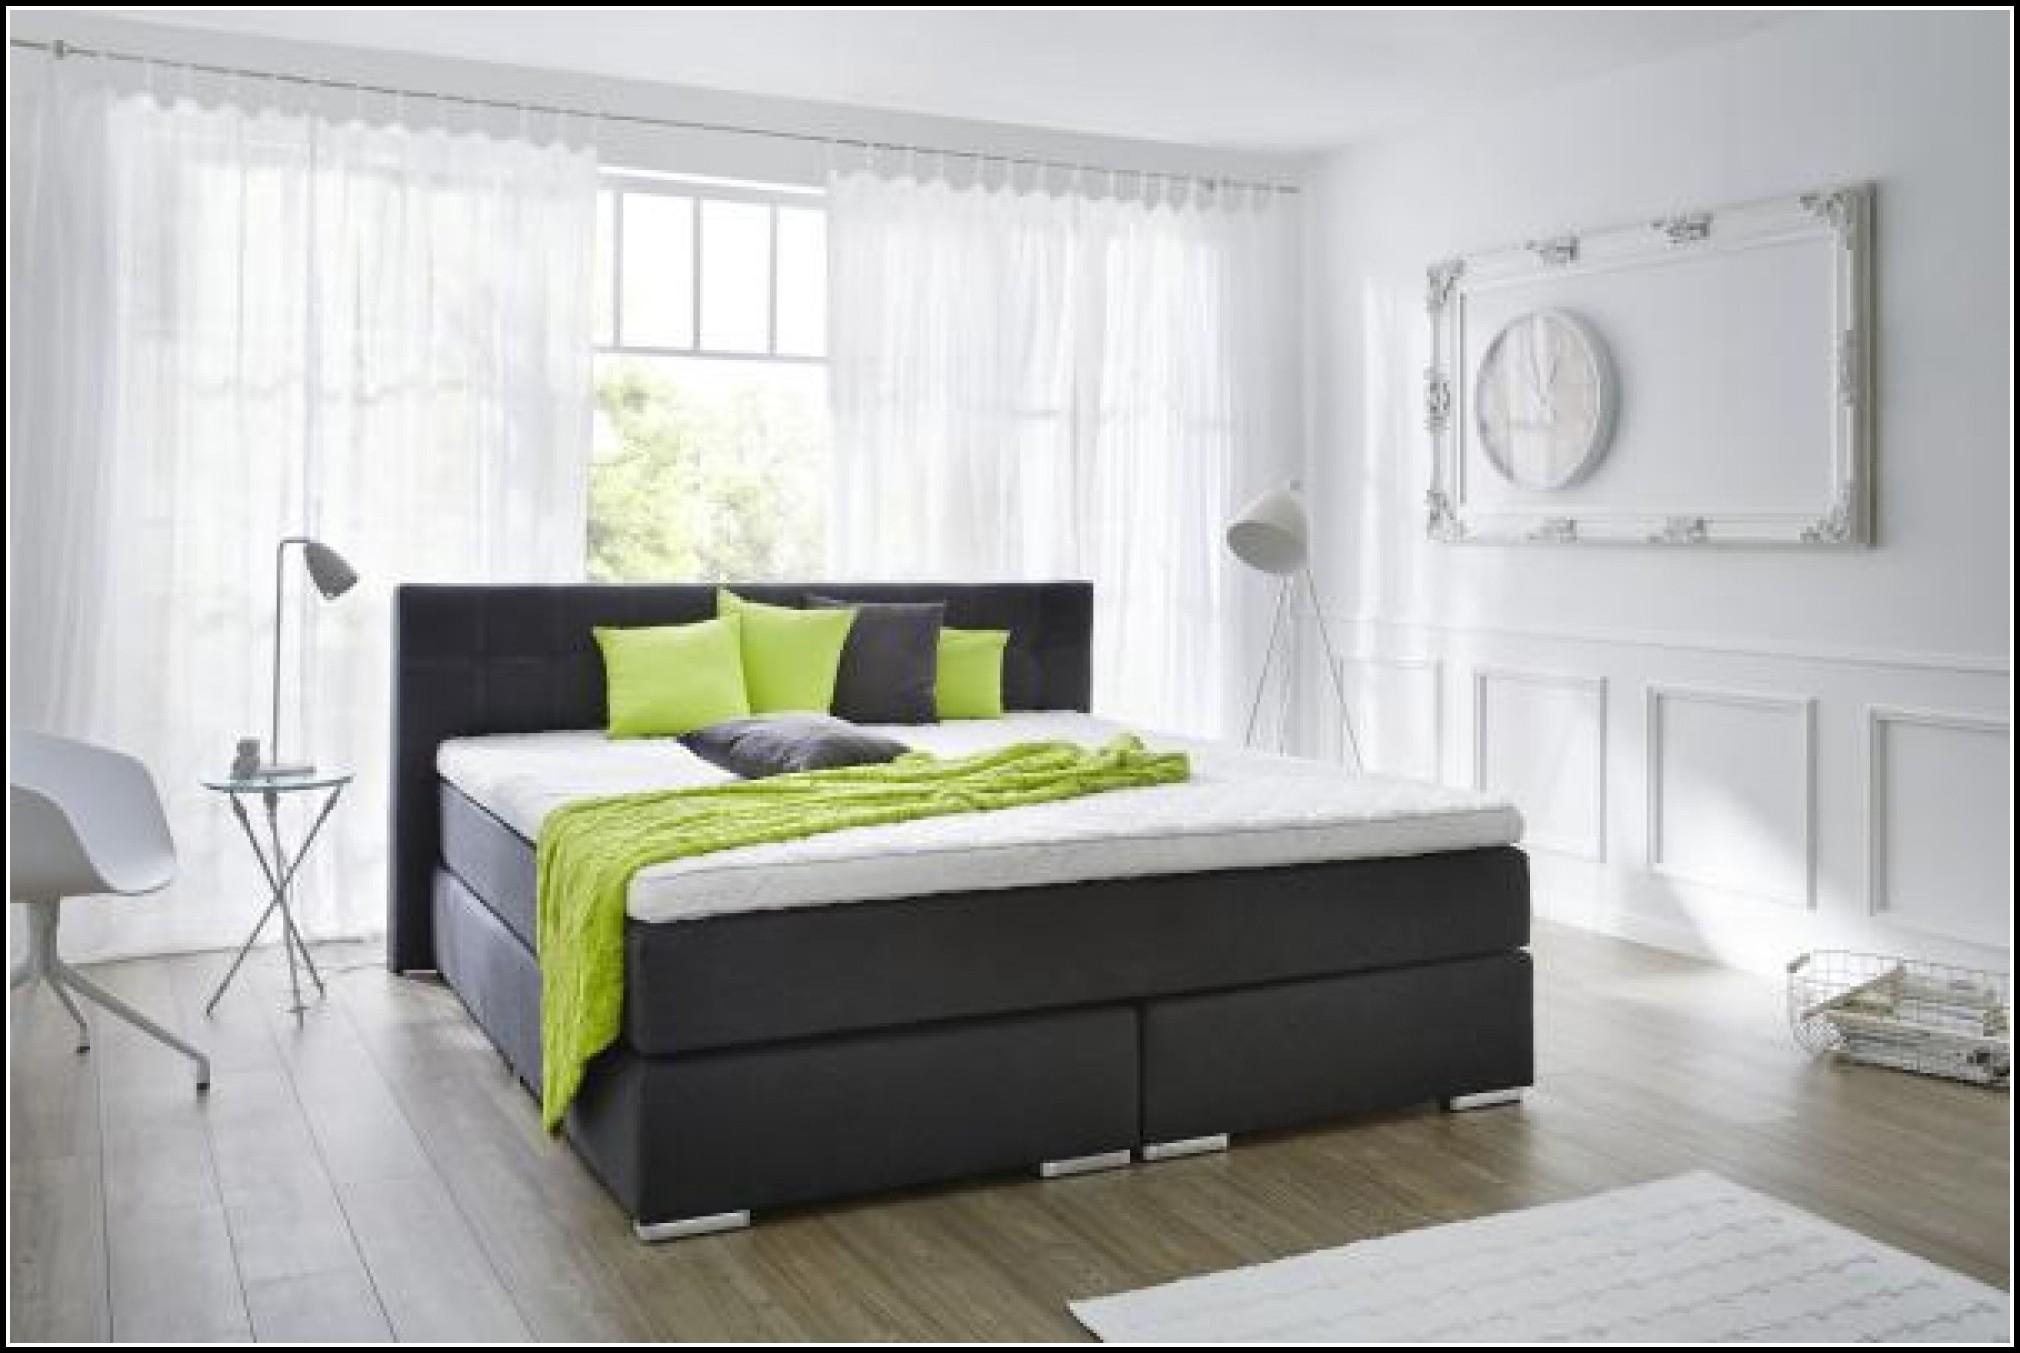 poco domane betten angebote betten house und dekor galerie pnwywxzrbn. Black Bedroom Furniture Sets. Home Design Ideas